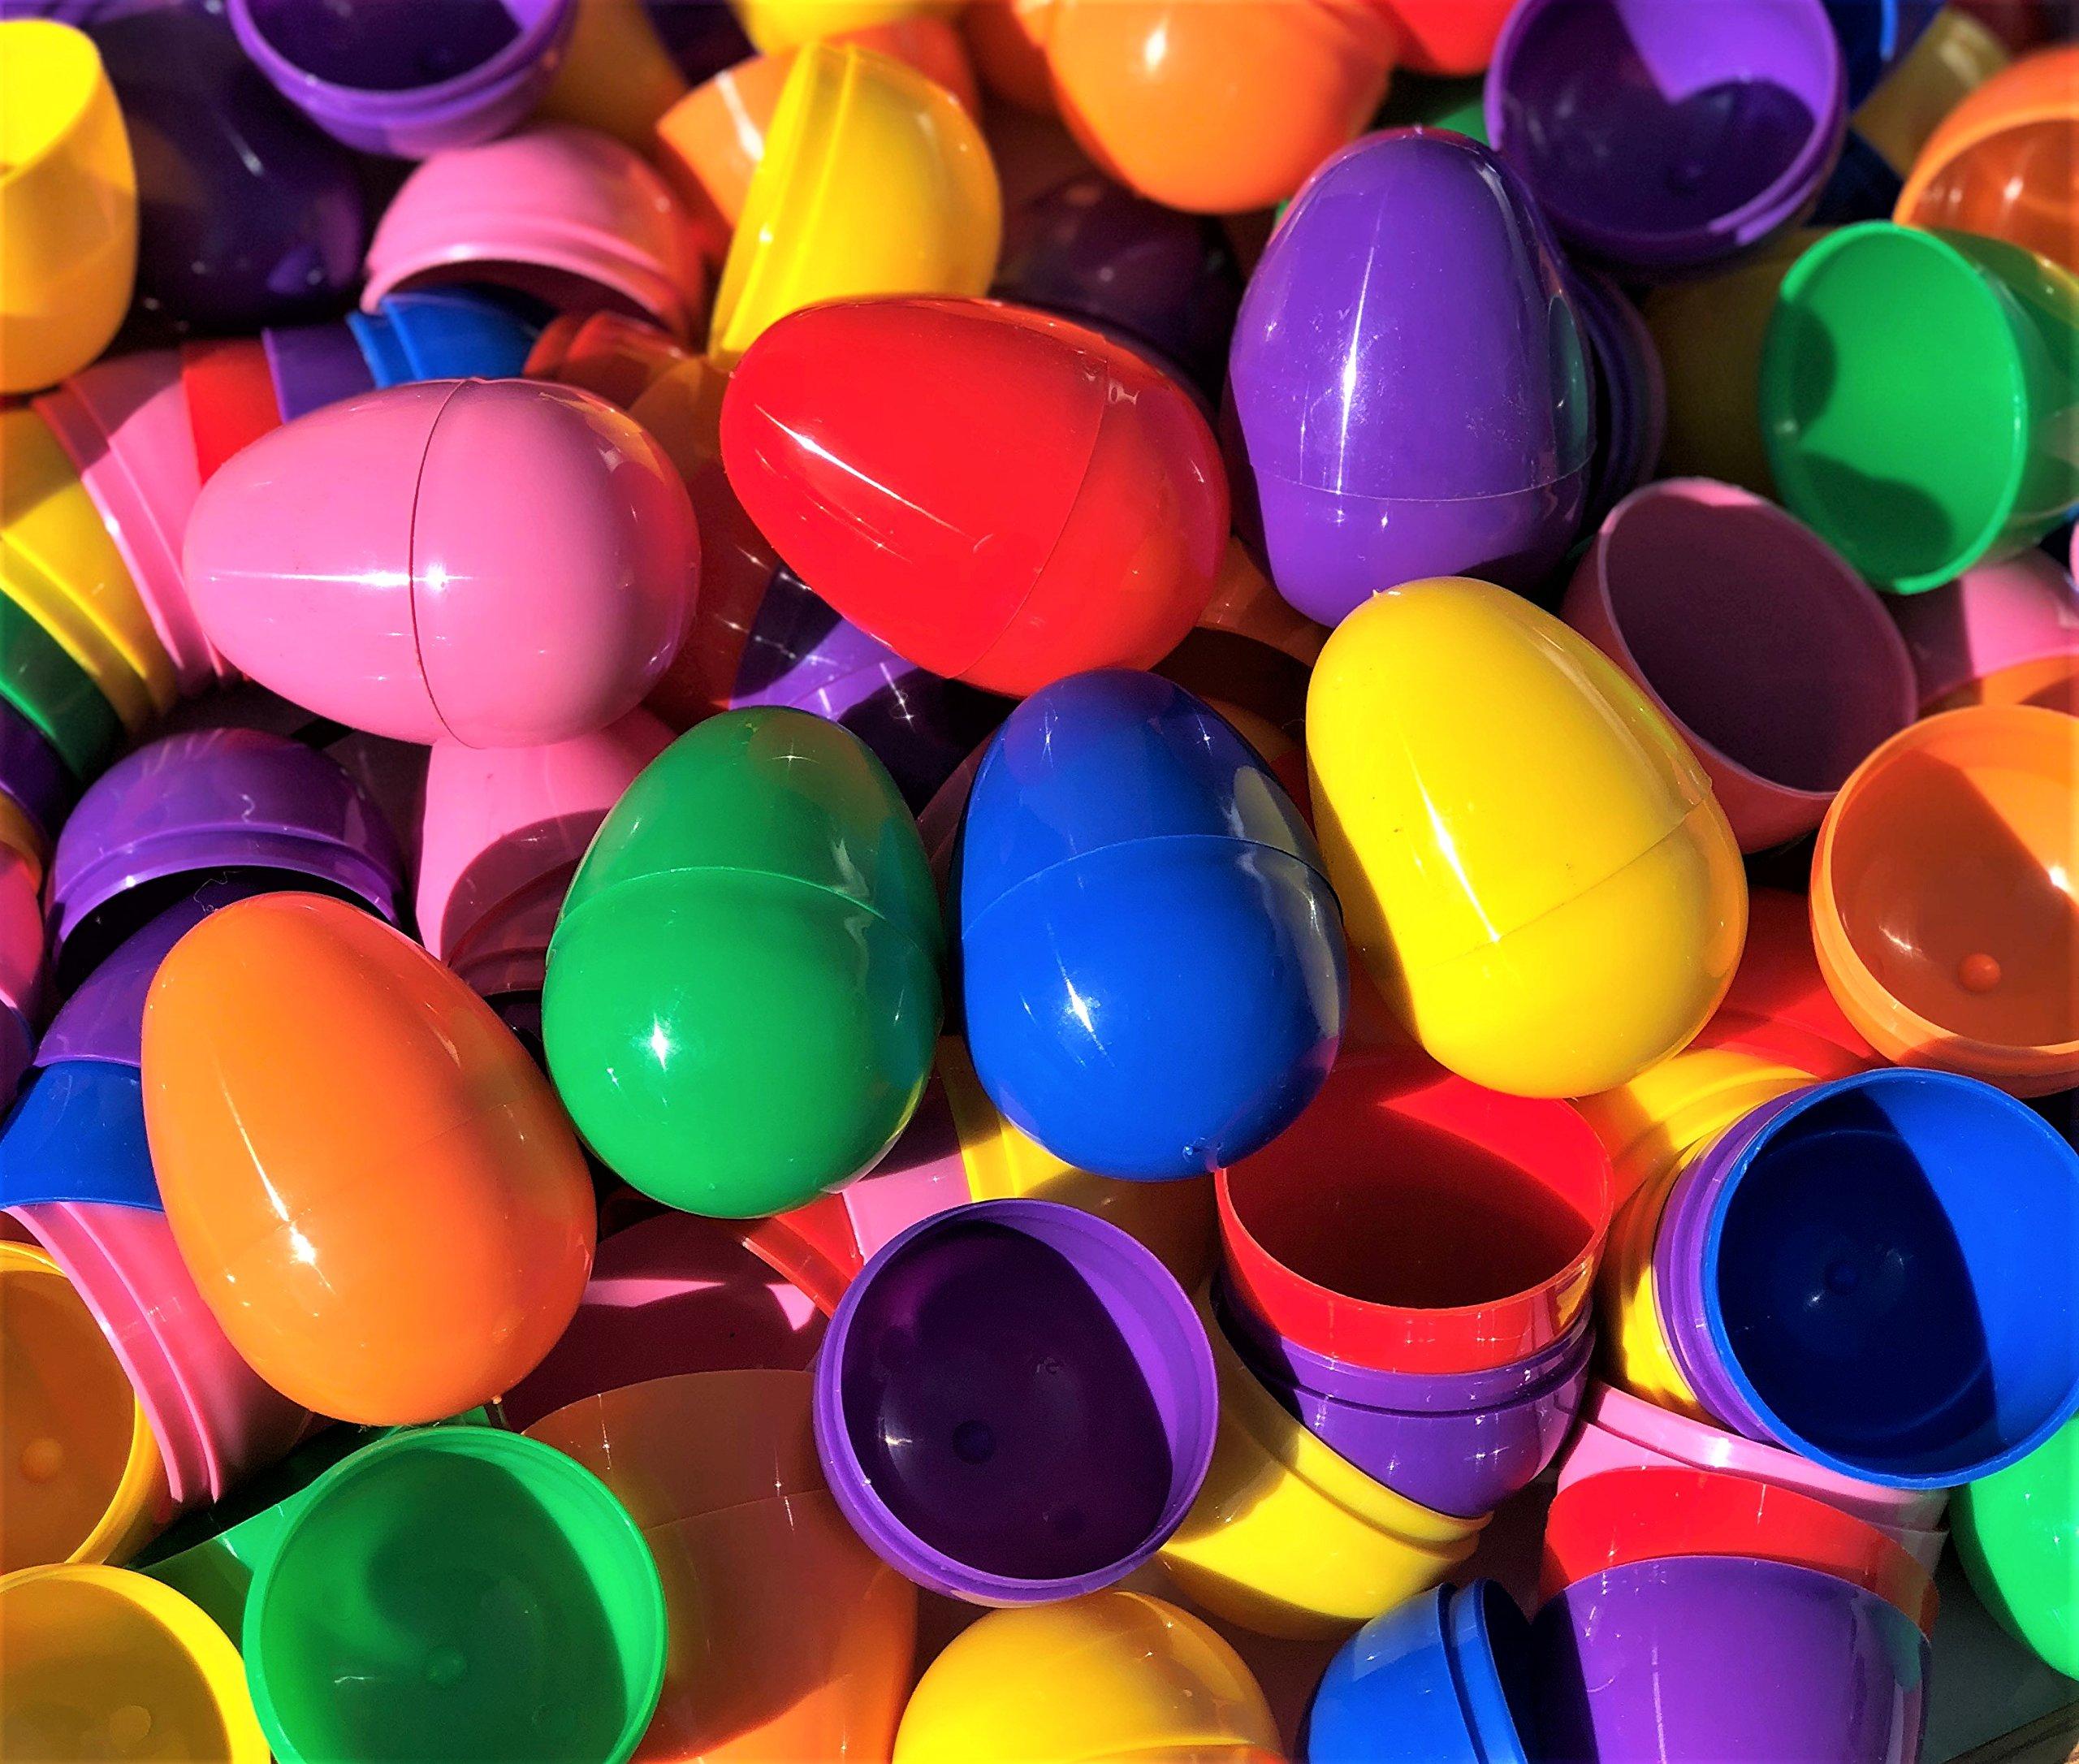 Assortmart 2.25 Assorted Color Plastic Eggs Totem World 288 Fillable Plastic Easter Egg Hunt Party Supply Pack